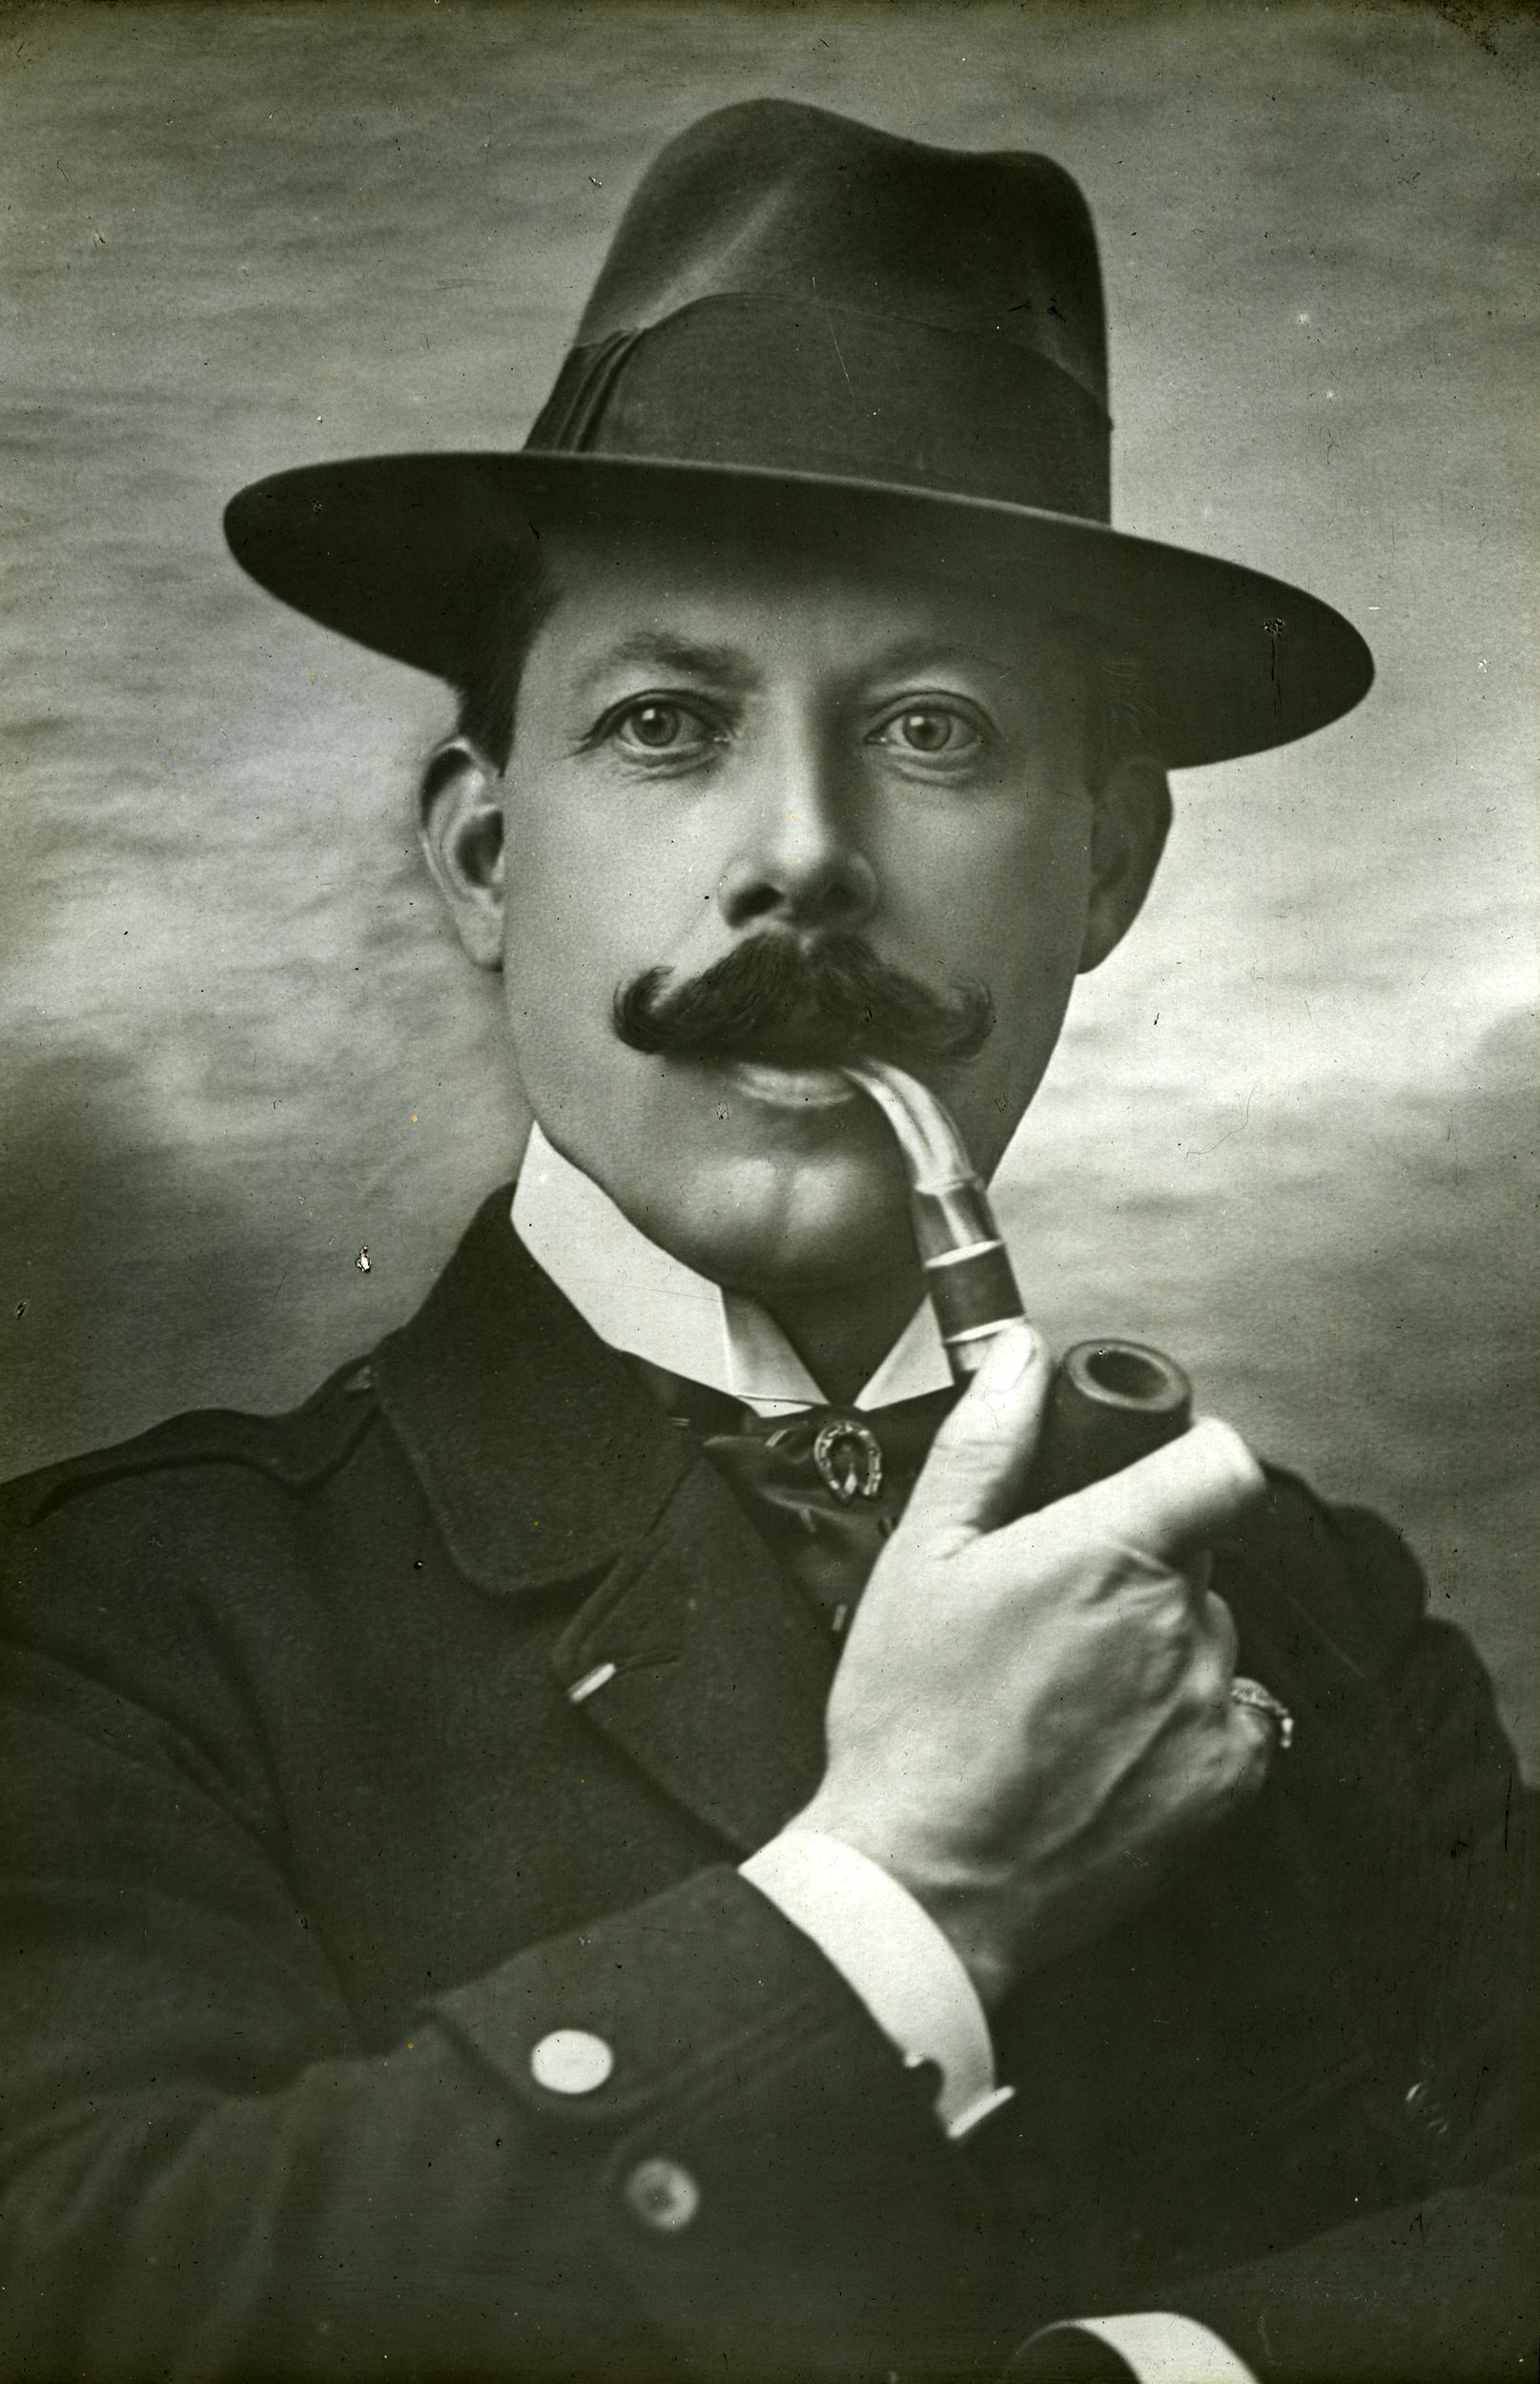 Image of Jean-Baptiste Tournassoud from Wikidata